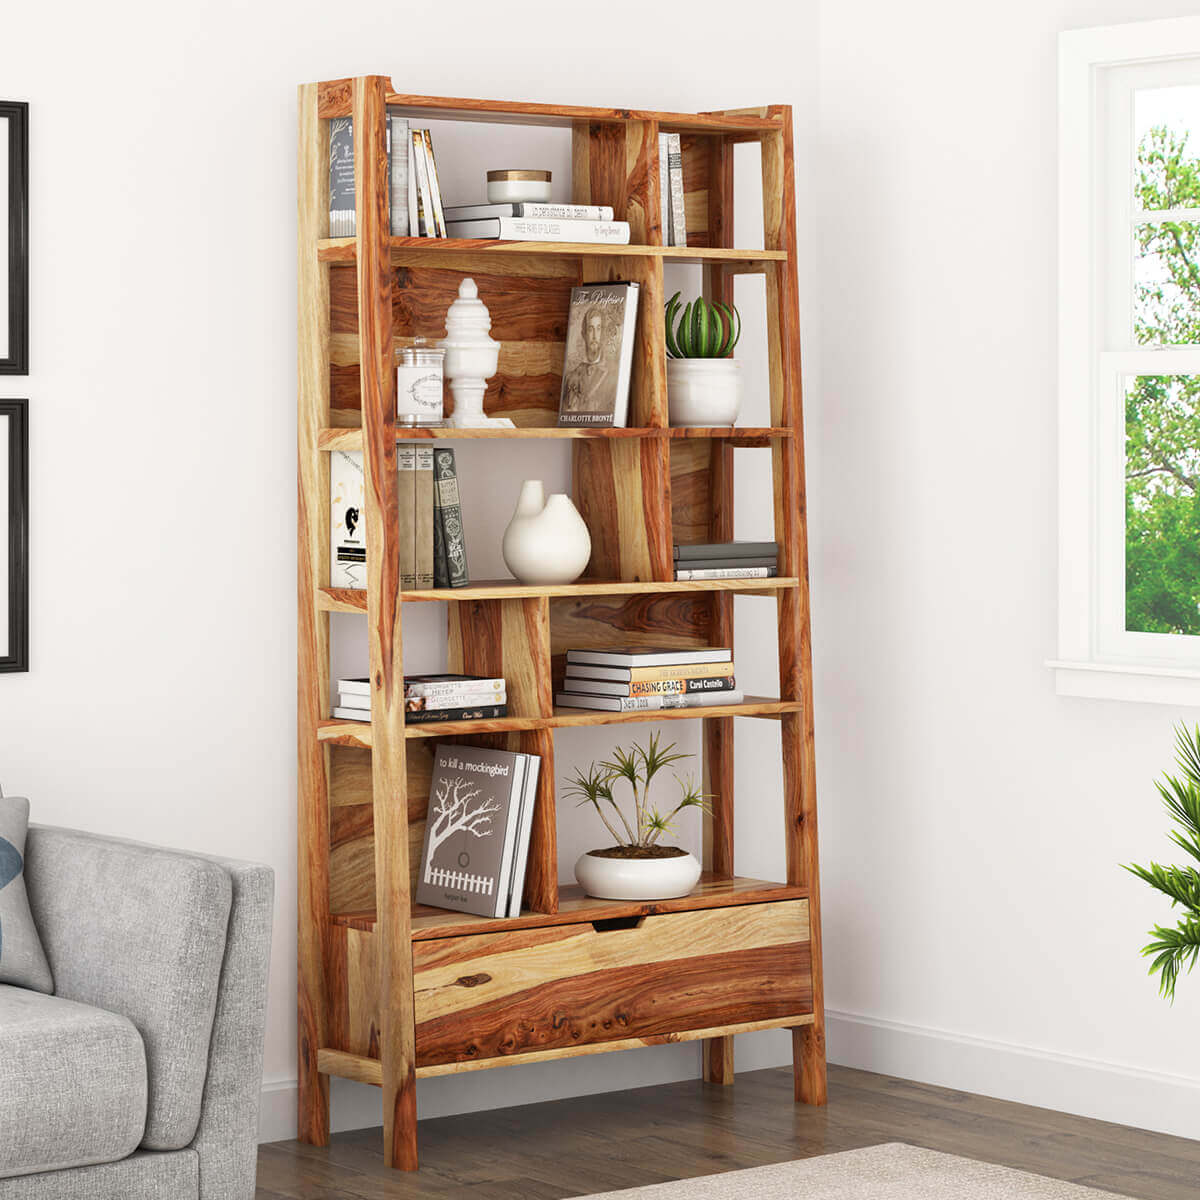 Leani Rustic Sheesham Solid Wood Open Ladder Bookshelf